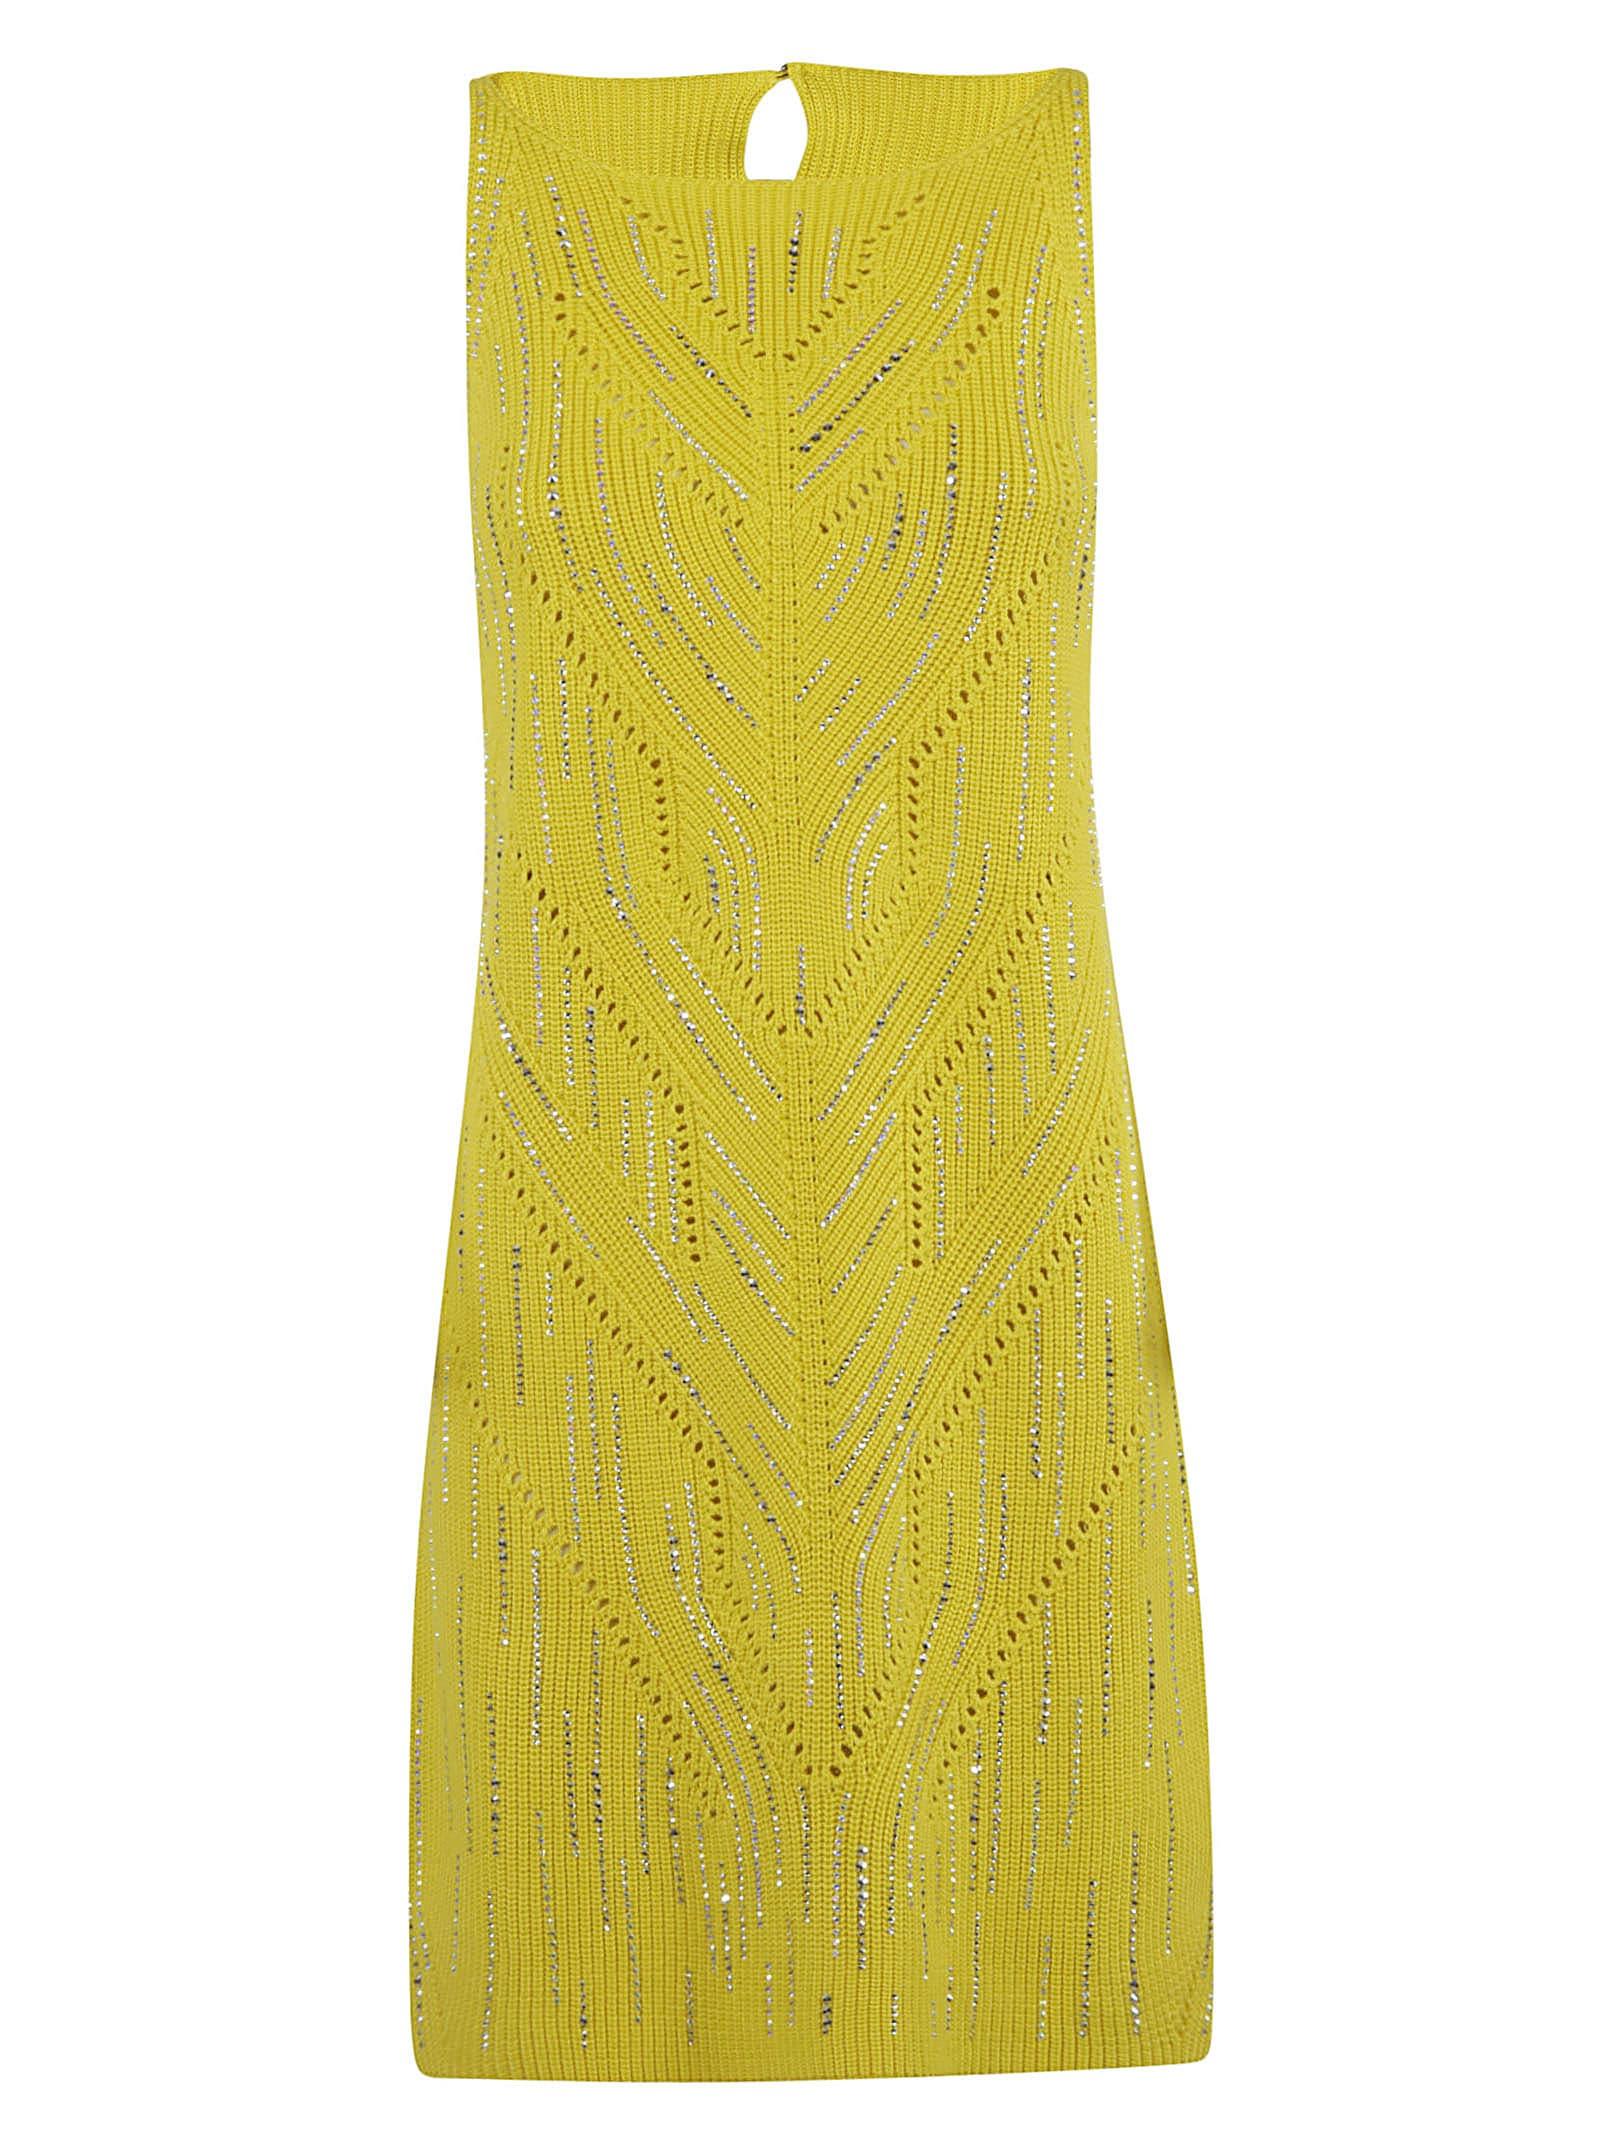 Buy Ermanno Scervino Rib Knit Embellished Dress online, shop Ermanno Scervino with free shipping